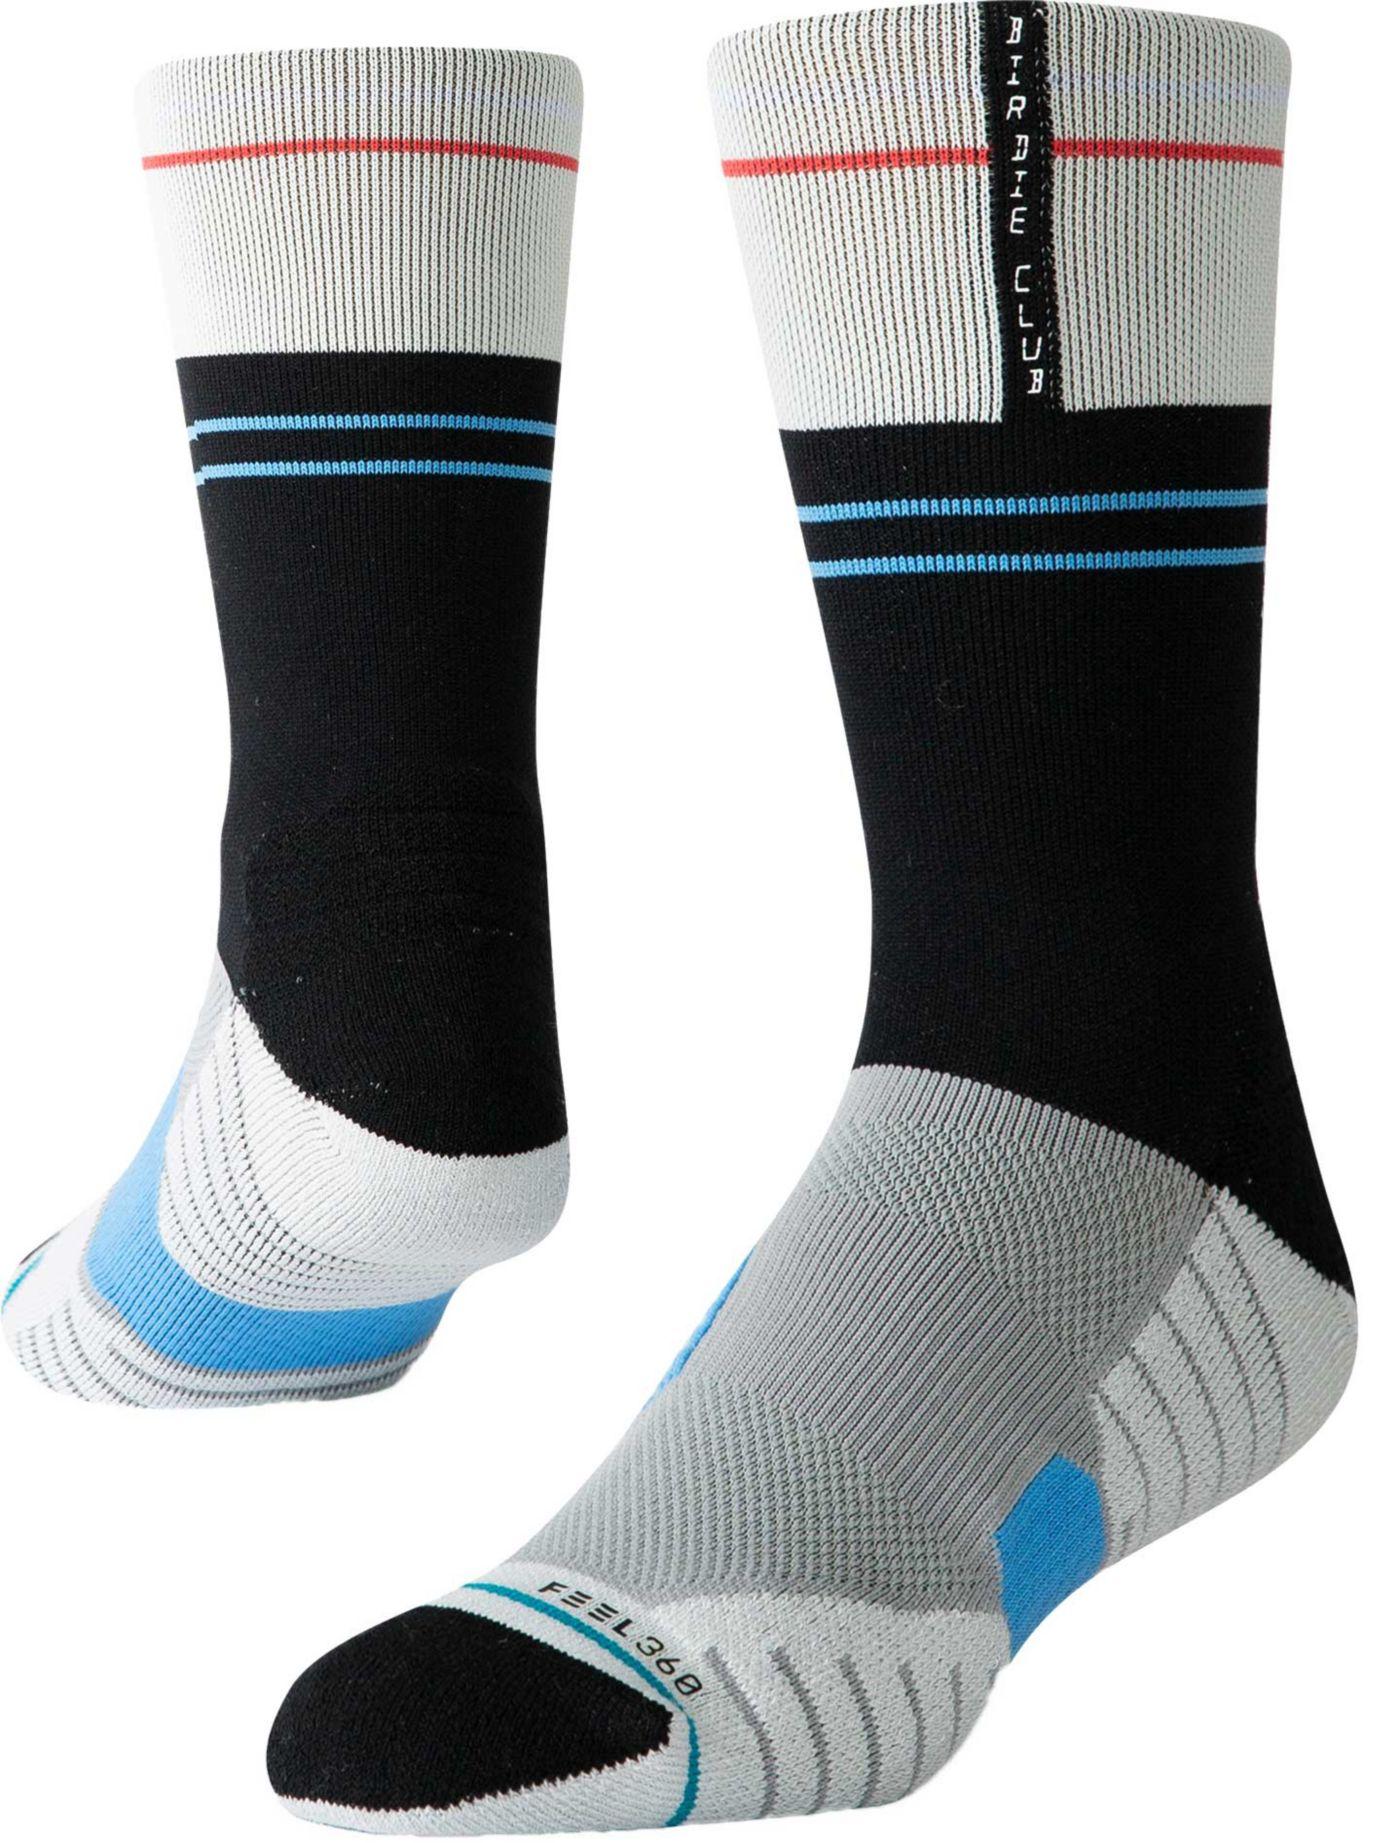 Stance Men's Pin Drop Crew Golf Socks